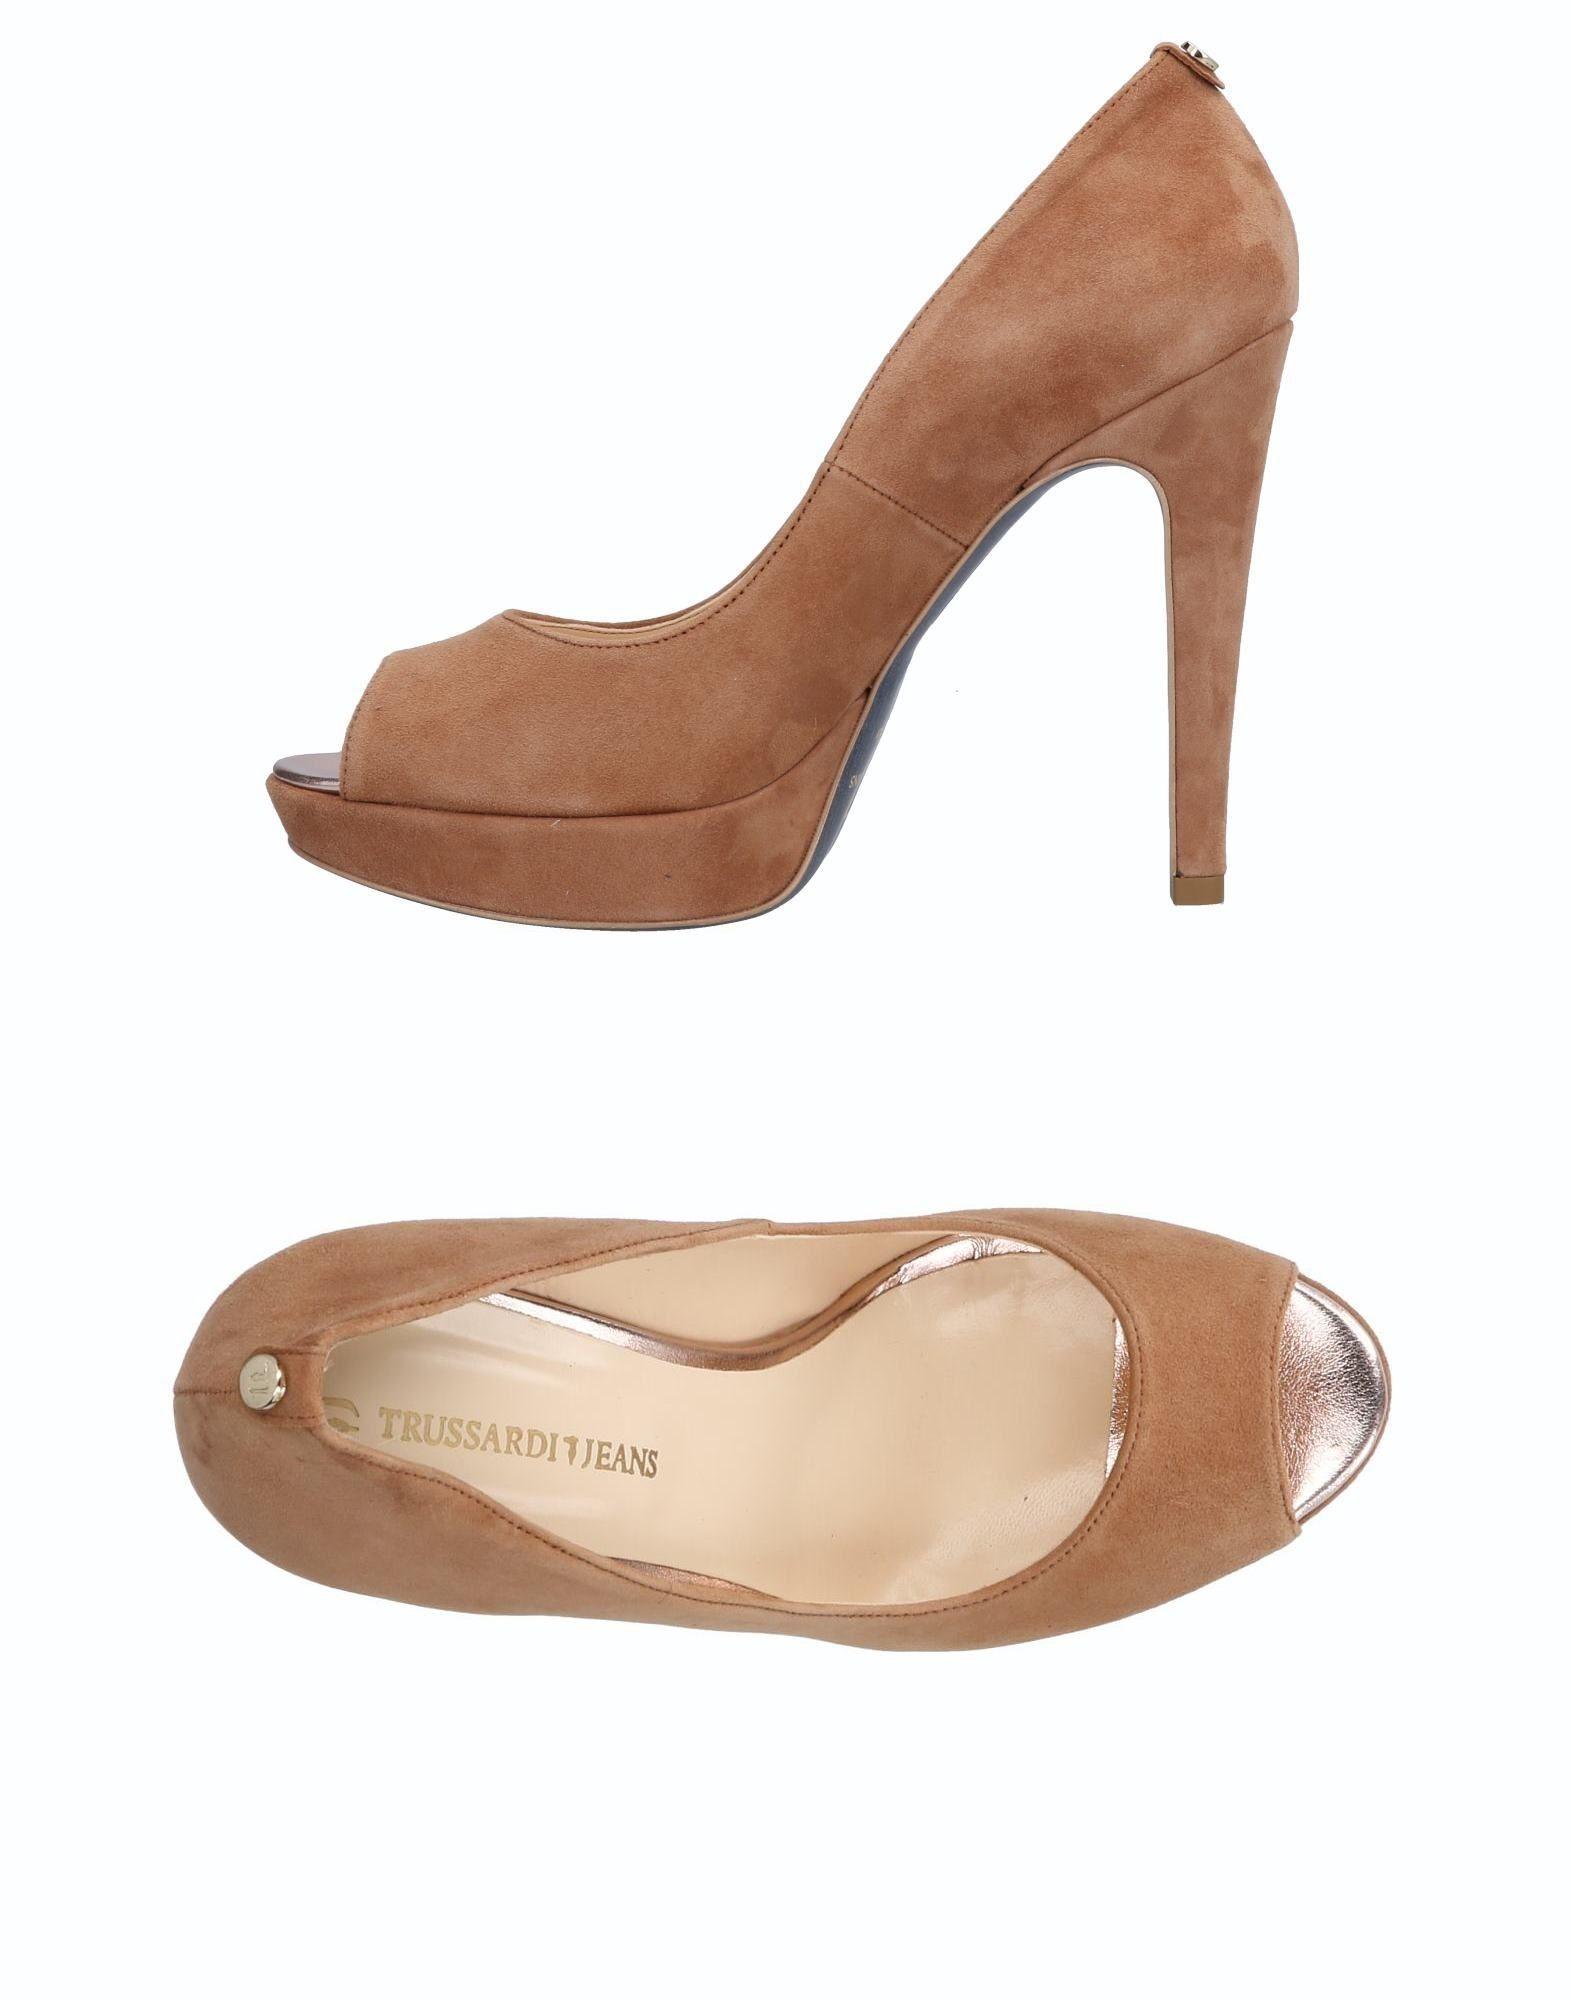 Gut um billige Schuhe zu  tragenTrussardi Jeans Pumps Damen  zu 11501532QQ 1f32bc